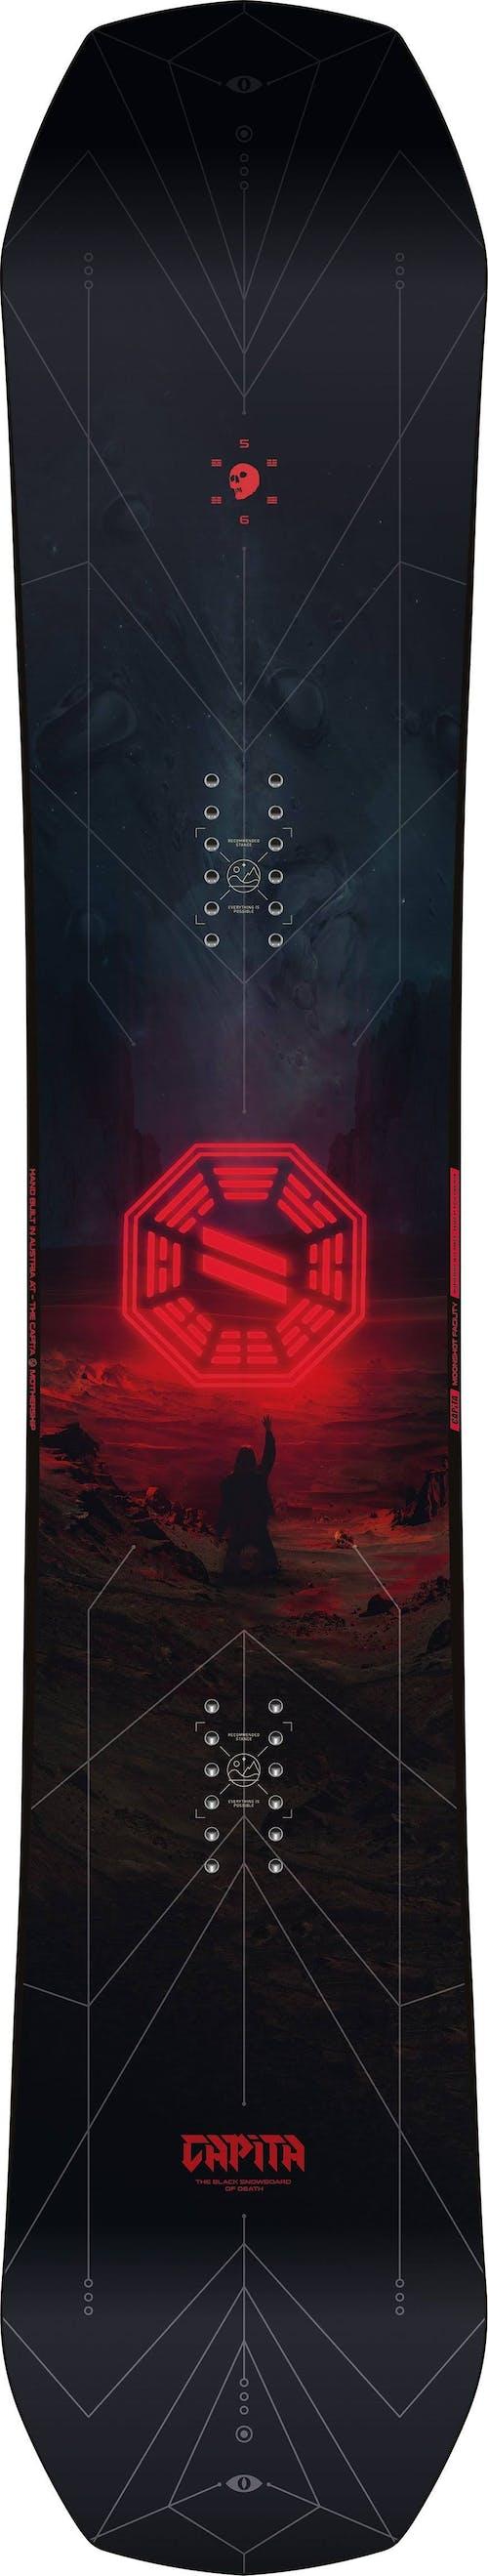 Capita Black Snowboard of Death - 2020